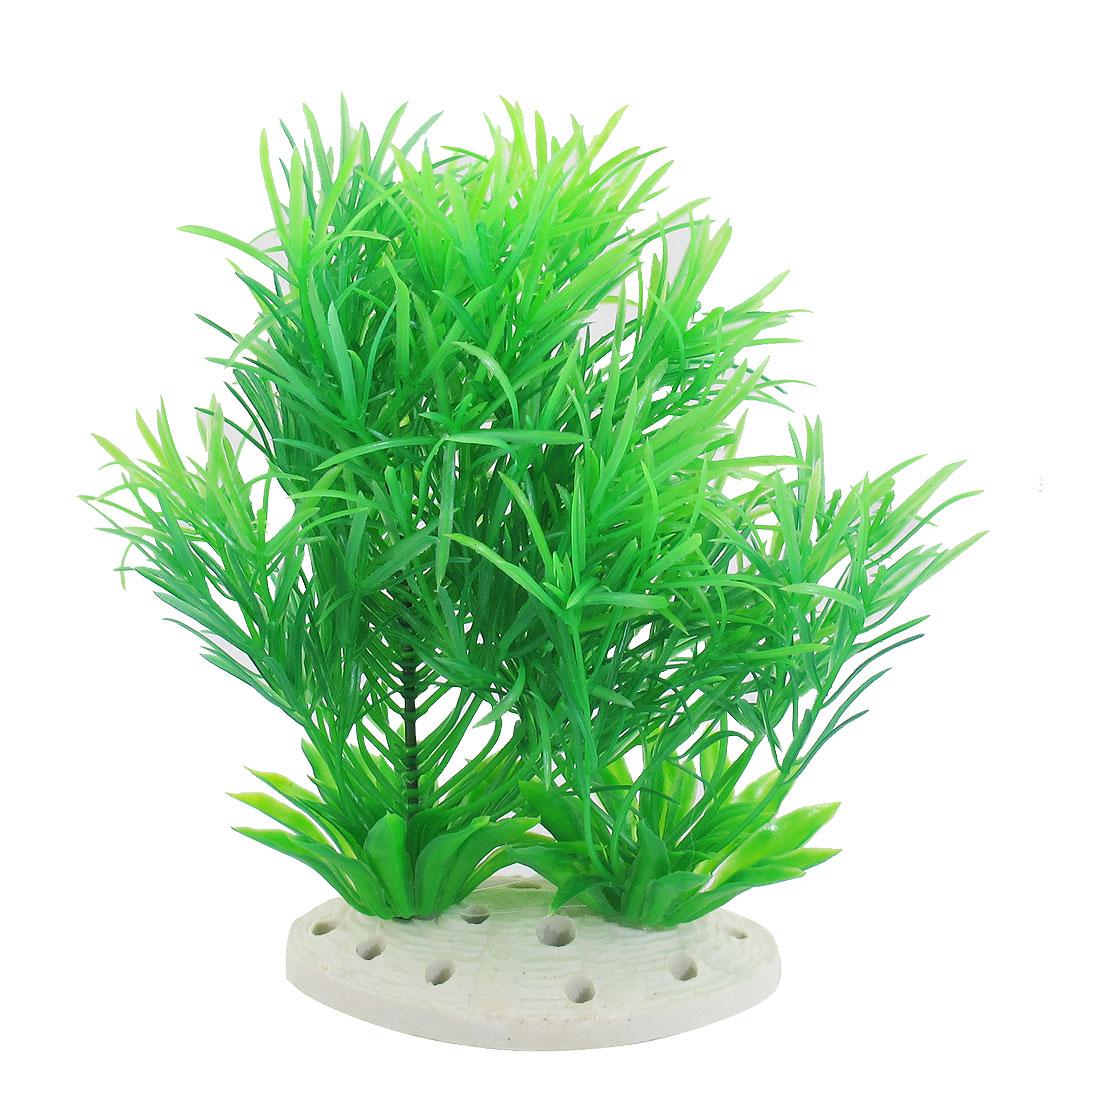 "Fish Pet Underwater Green Plastic Plants Fish Tank Aquarium Ornament 7.1"""